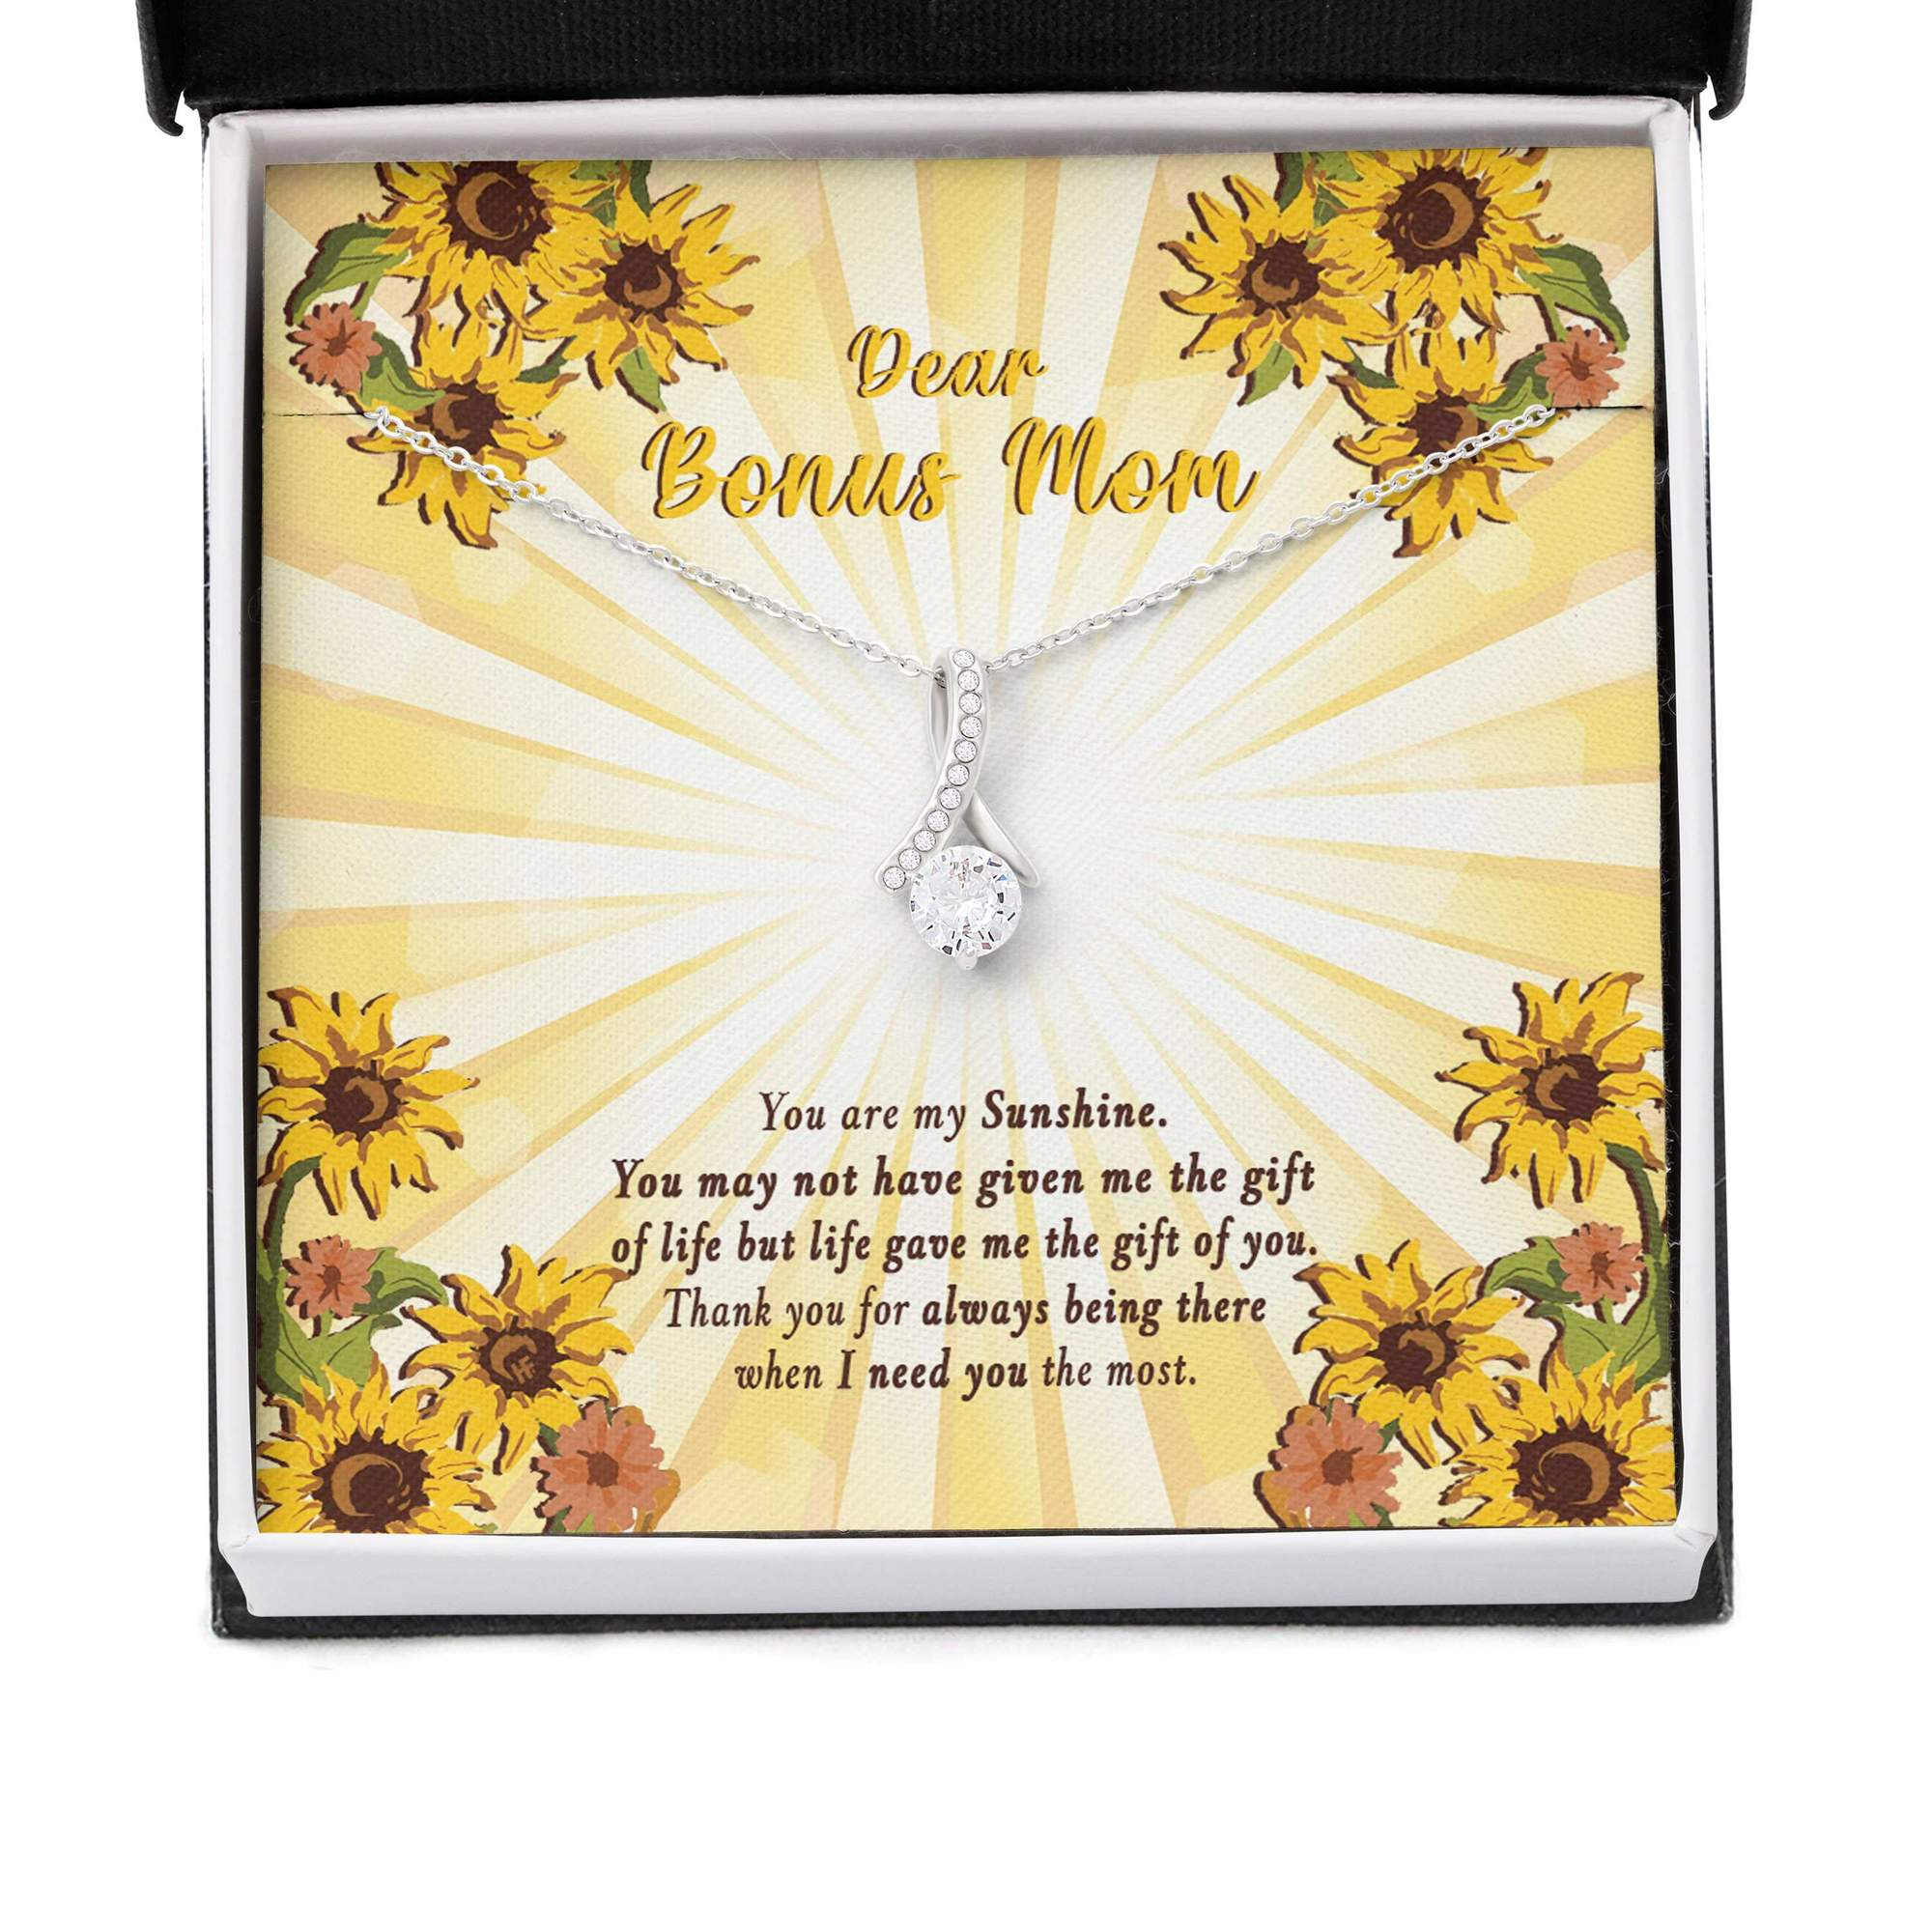 Dear Bonus Mom You Are My Sunshine Alluring Necklace 2